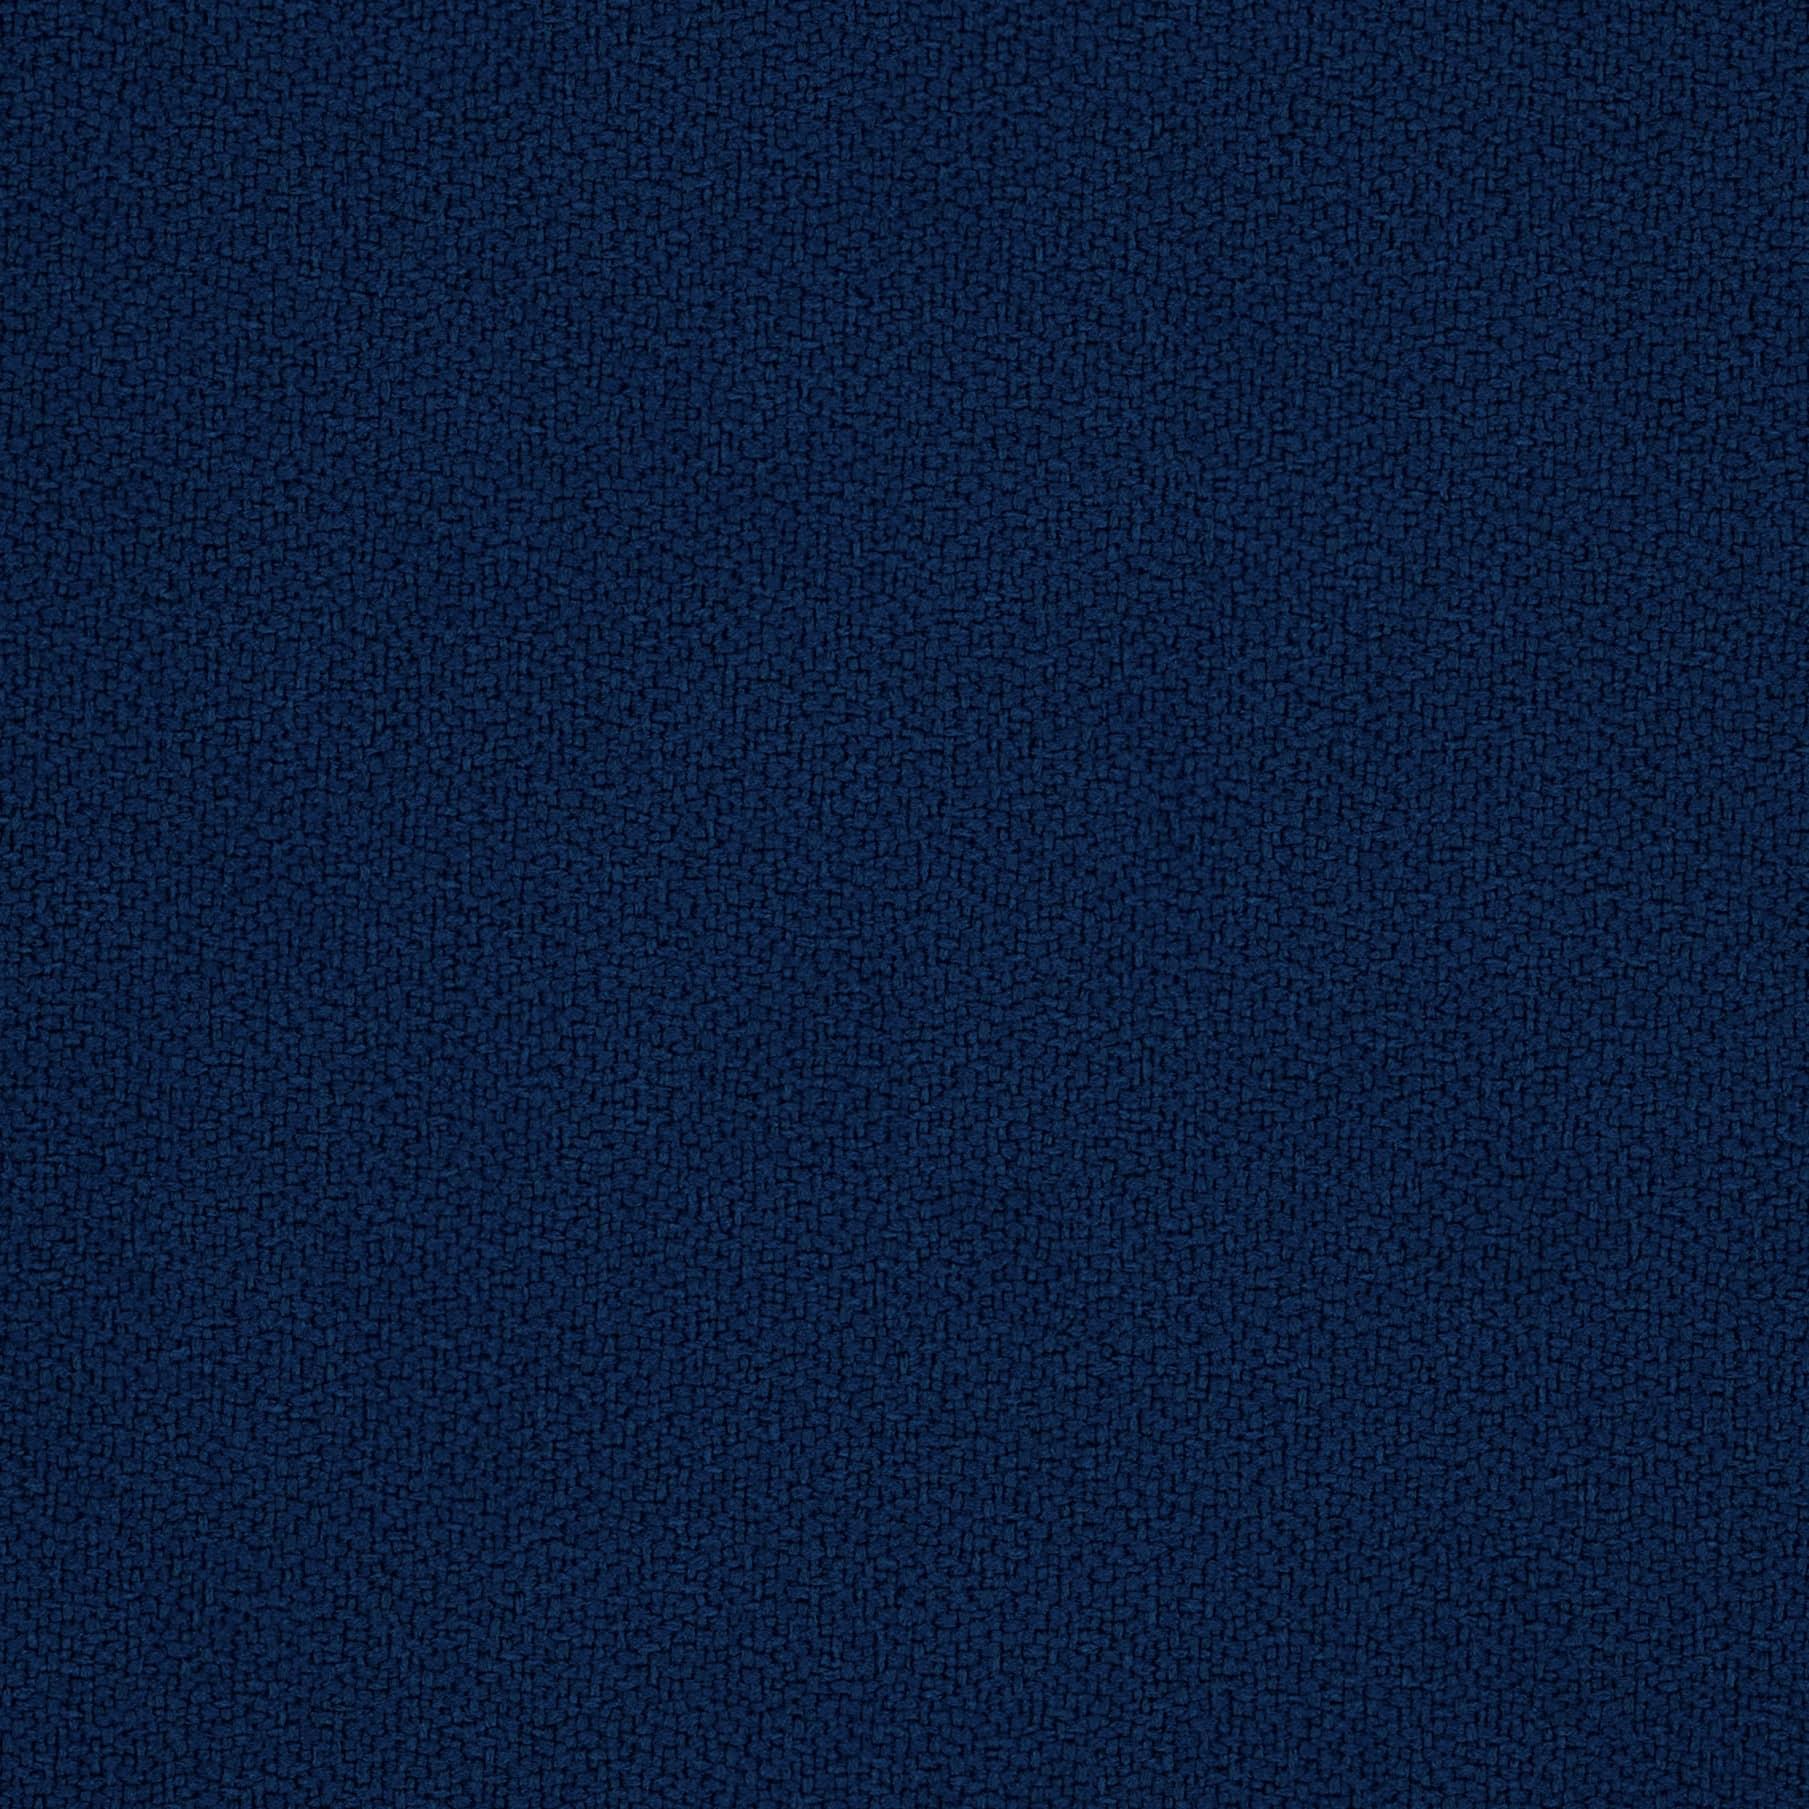 Phoenix Blau